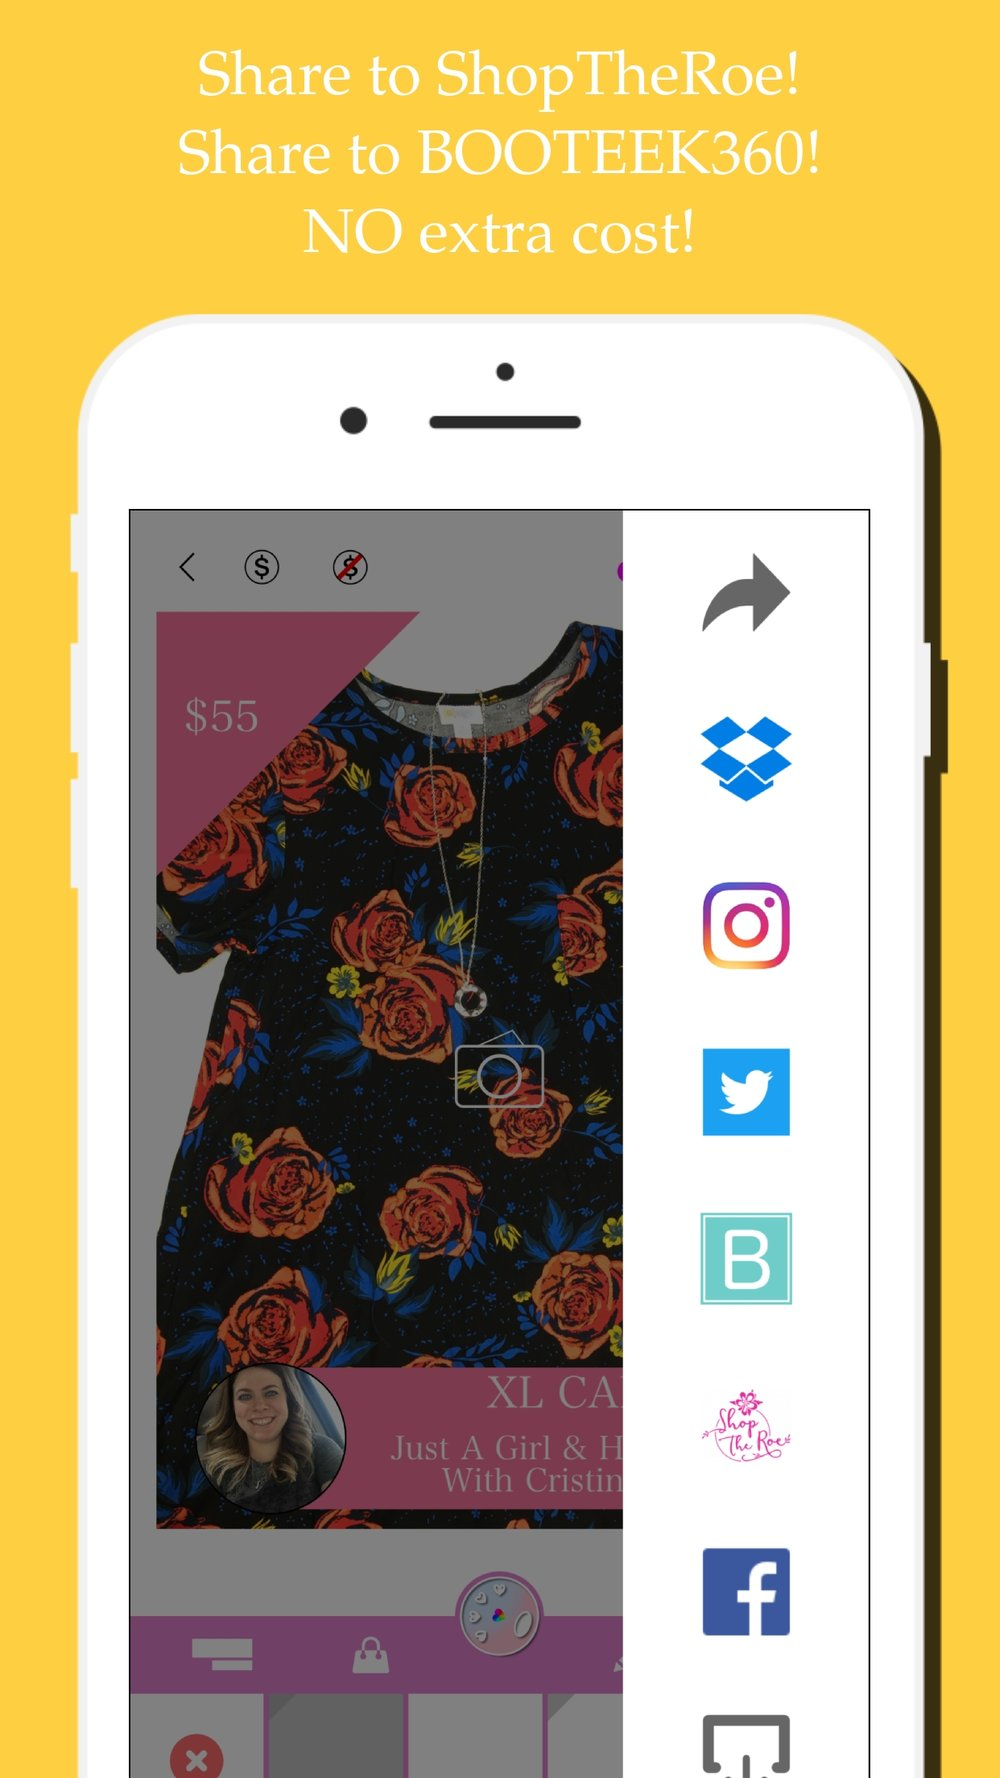 1_5.5 inch - iPhone 7 Plus_screen__1 copy 3.jpg